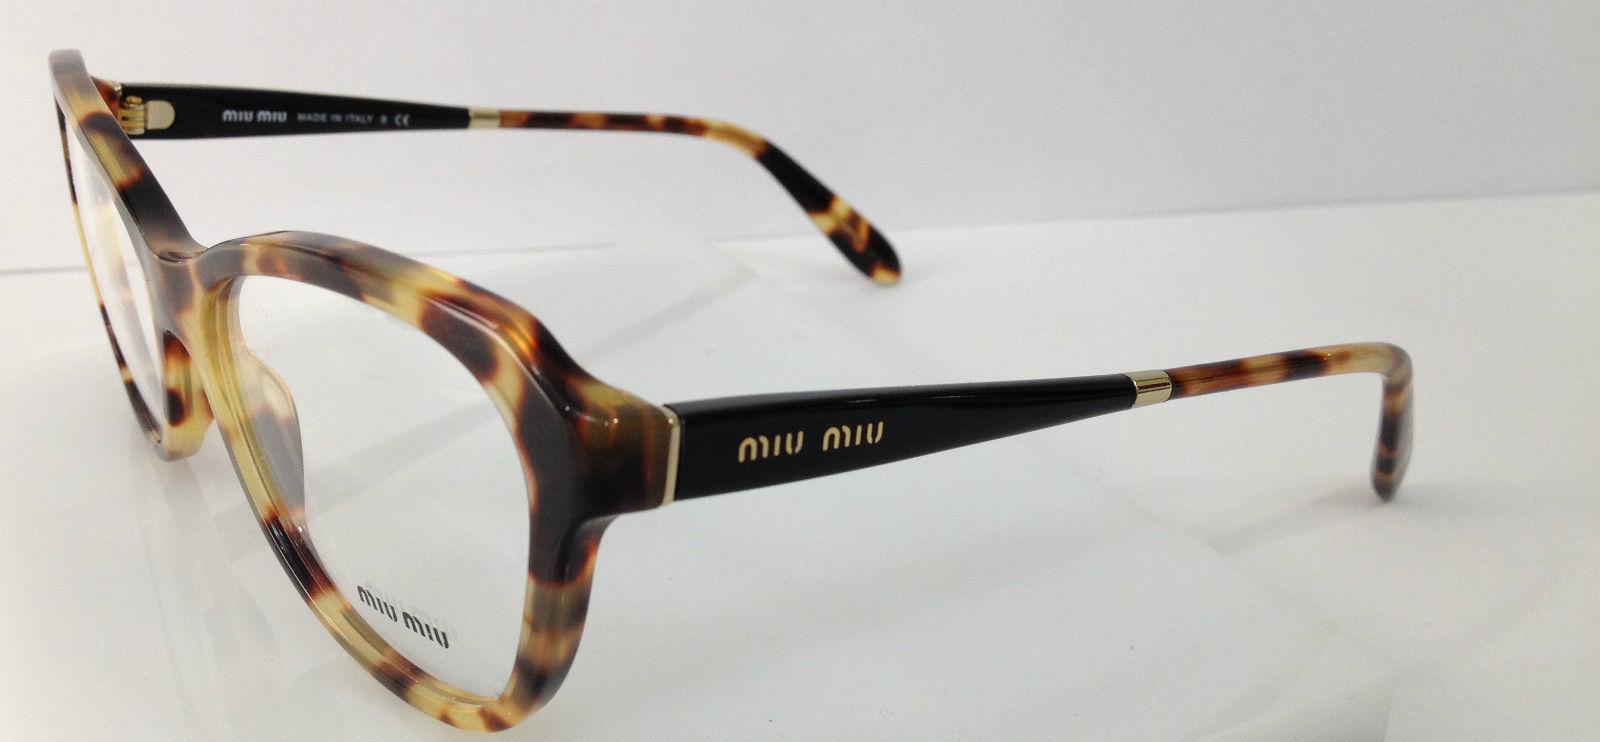 Miu Miu VMU 01N Blonde Tortoise 7S0-1O1 and similar items